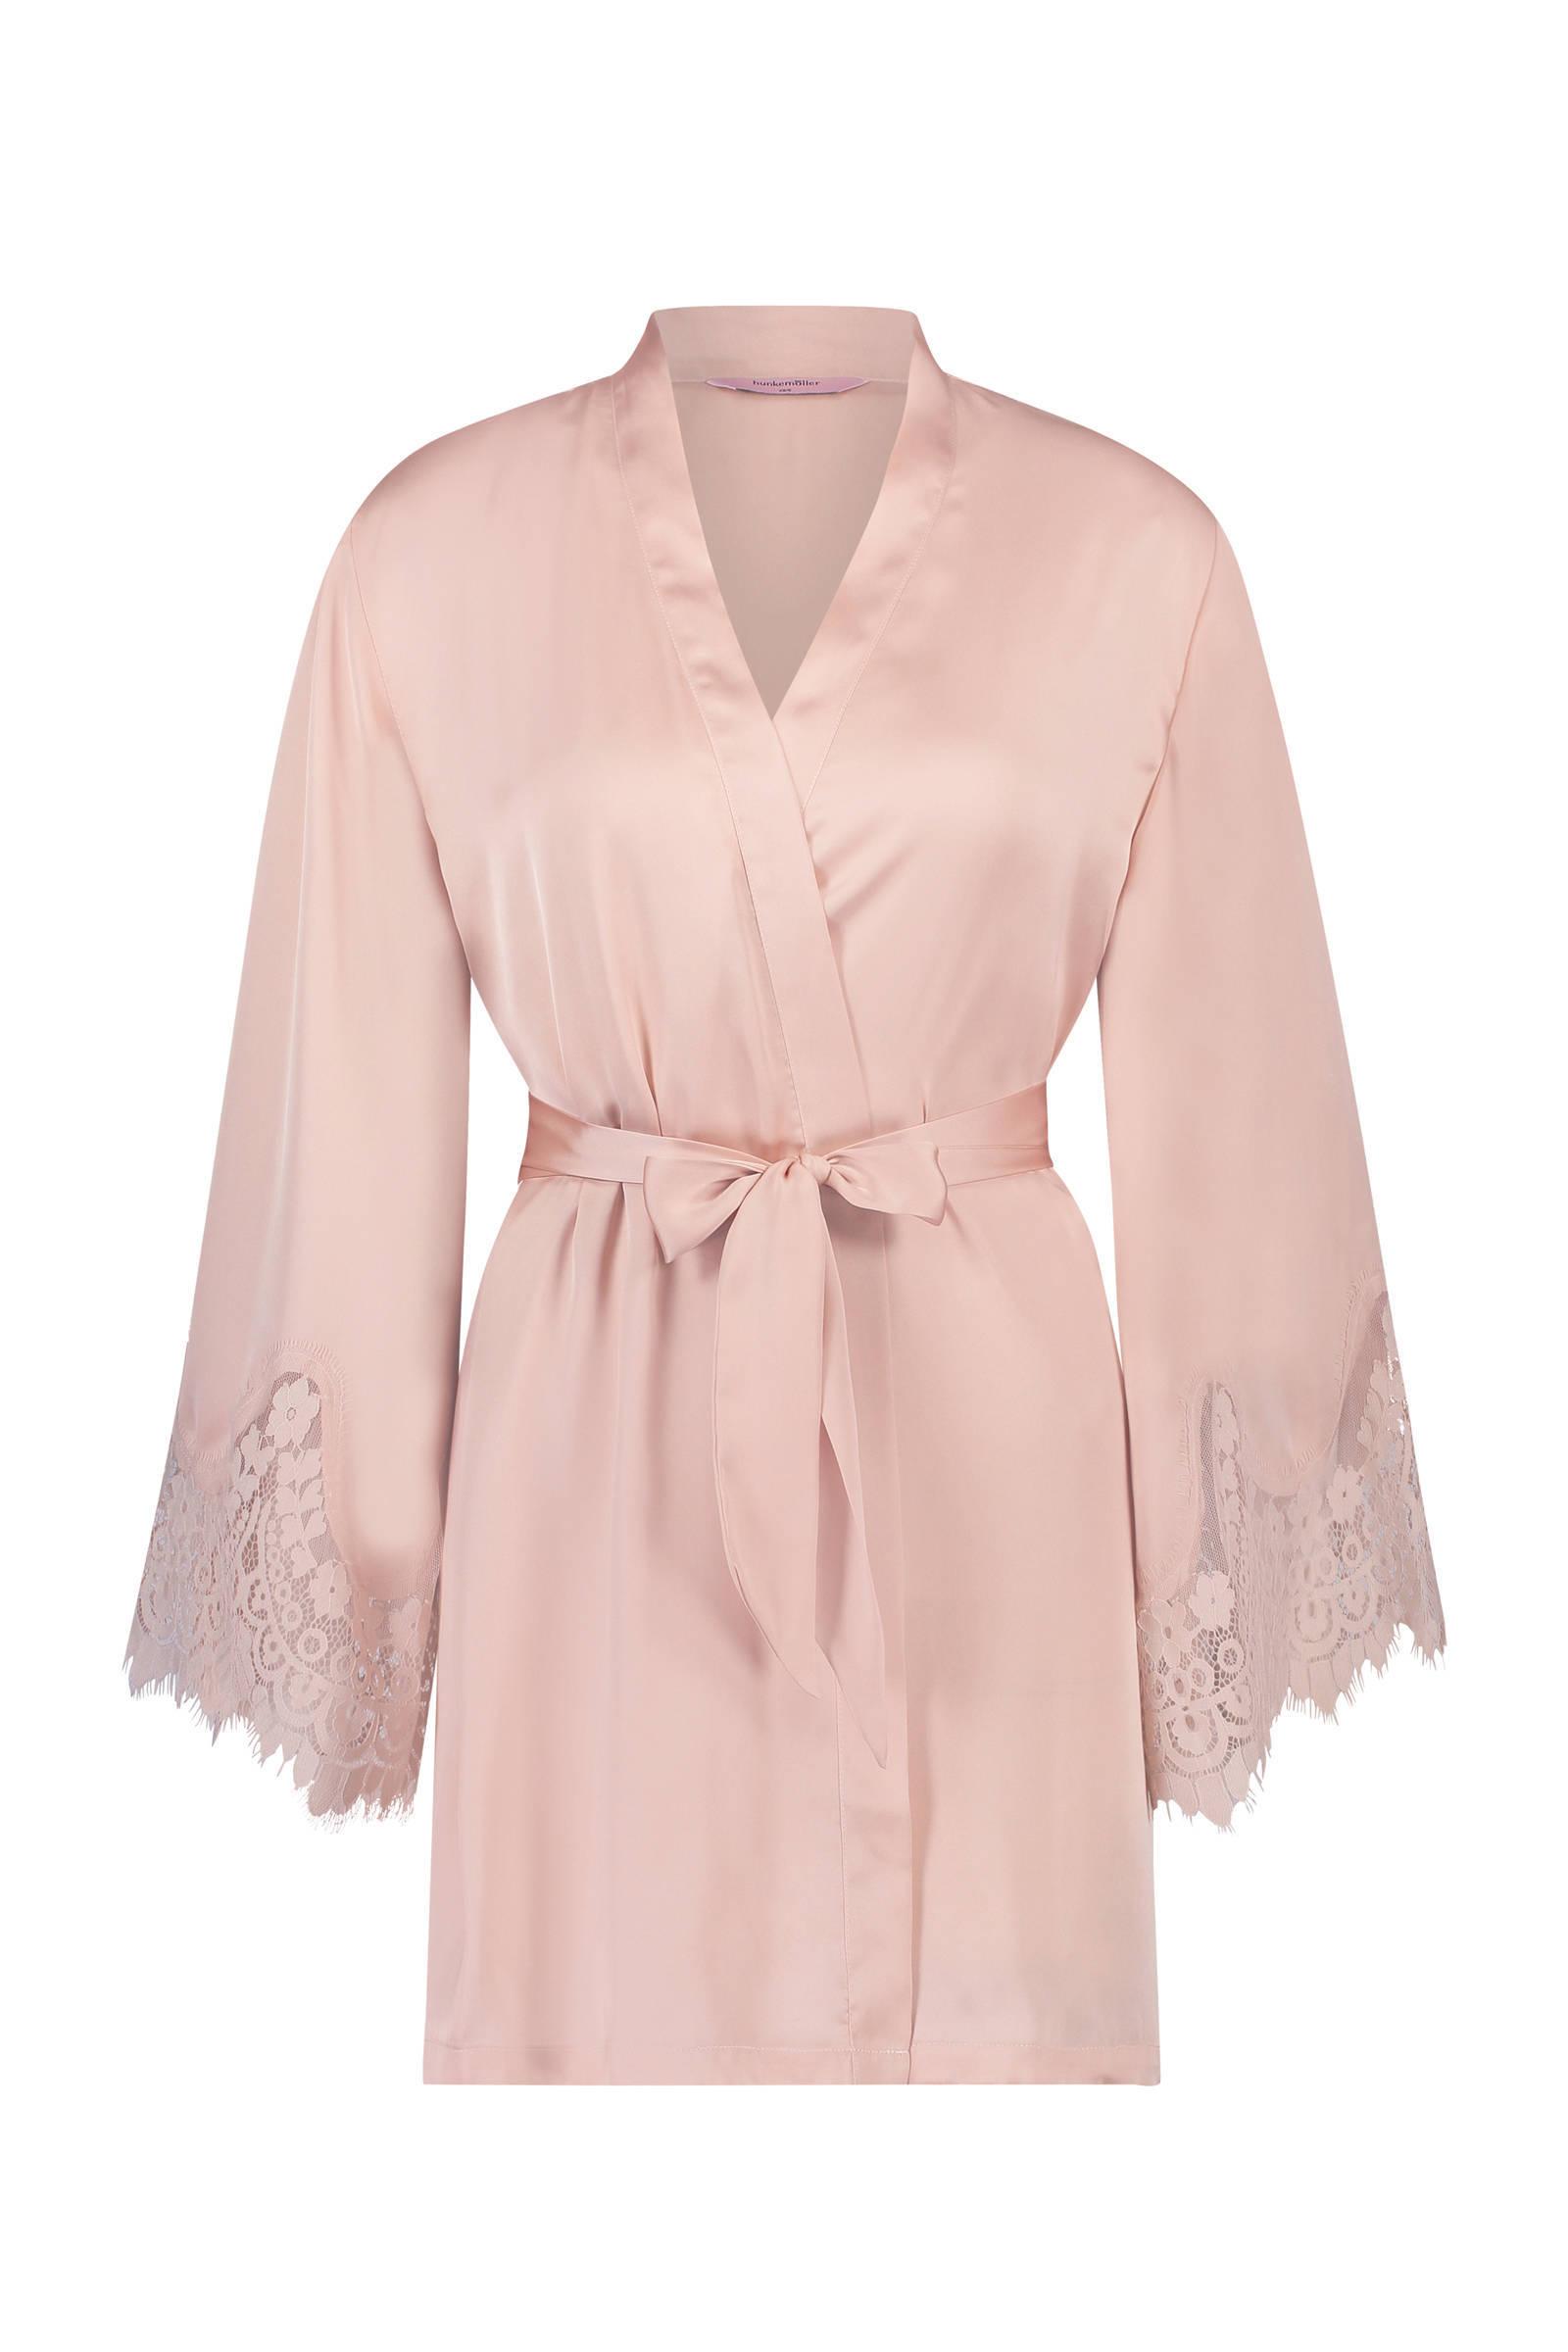 Hunkemöller  satijnen kimono roze